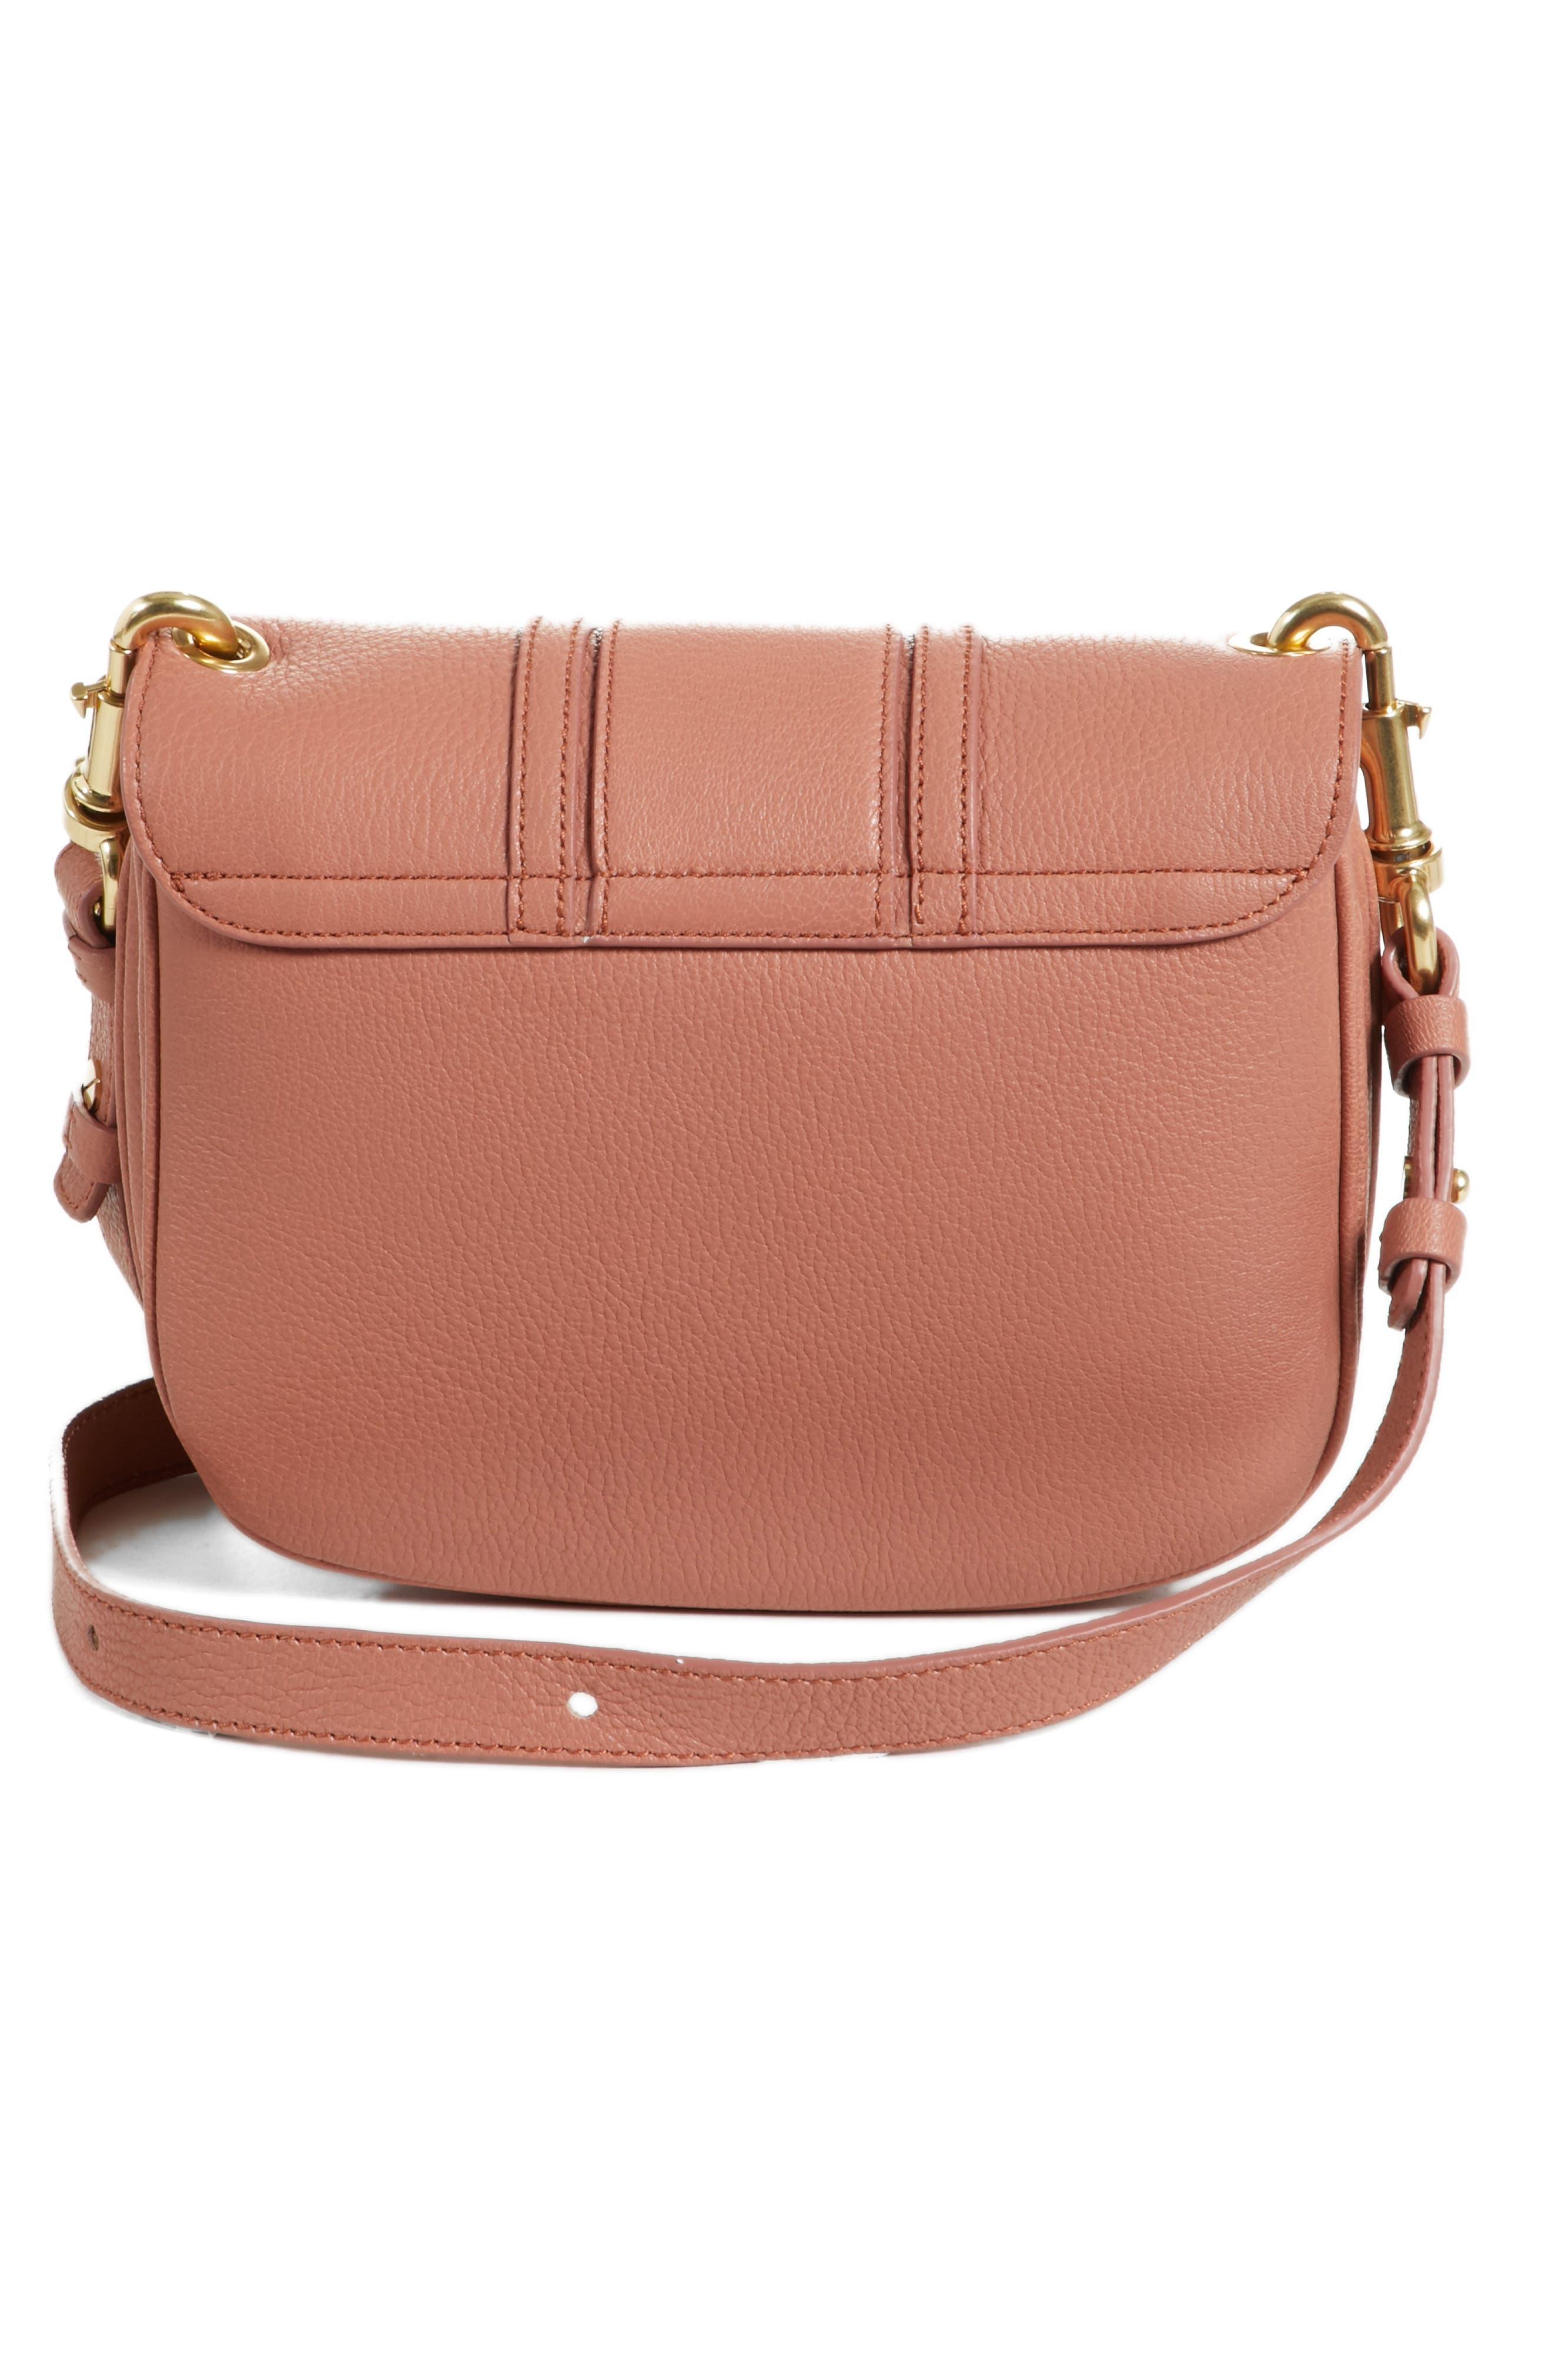 Hana Small Leather Crossbody Bag,                             Alternate thumbnail 19, color,